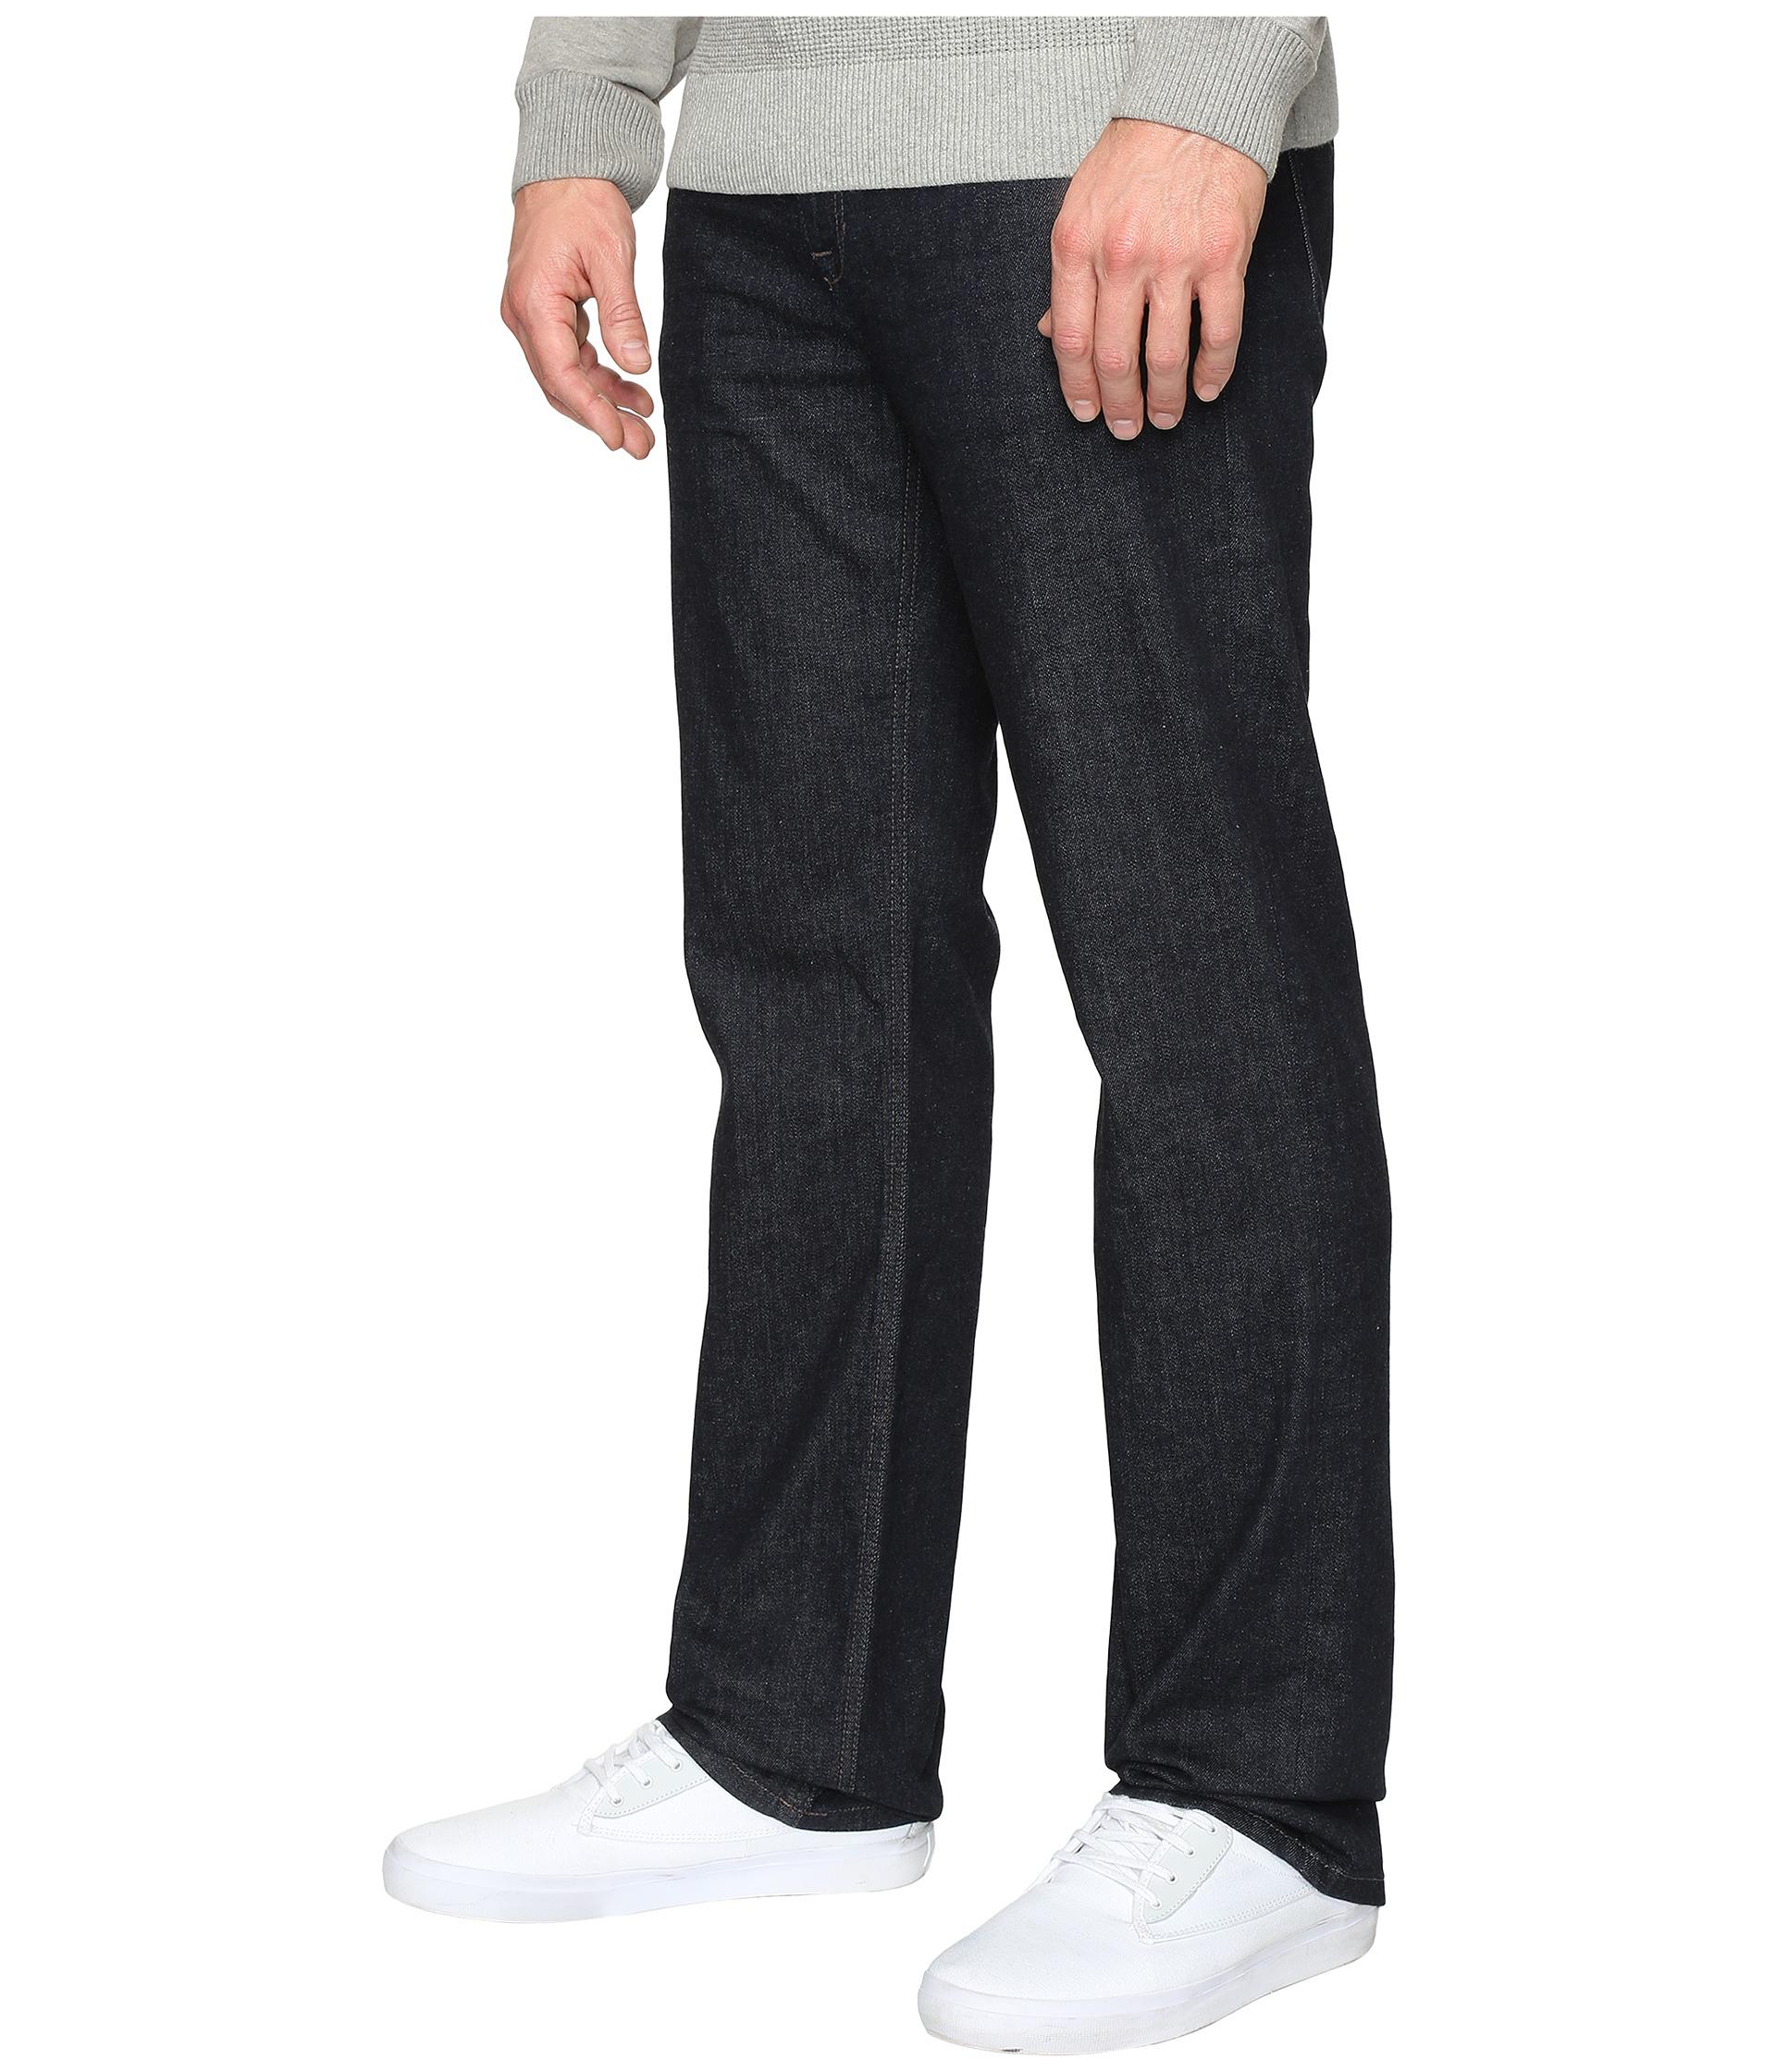 Joe bush vintage jeans